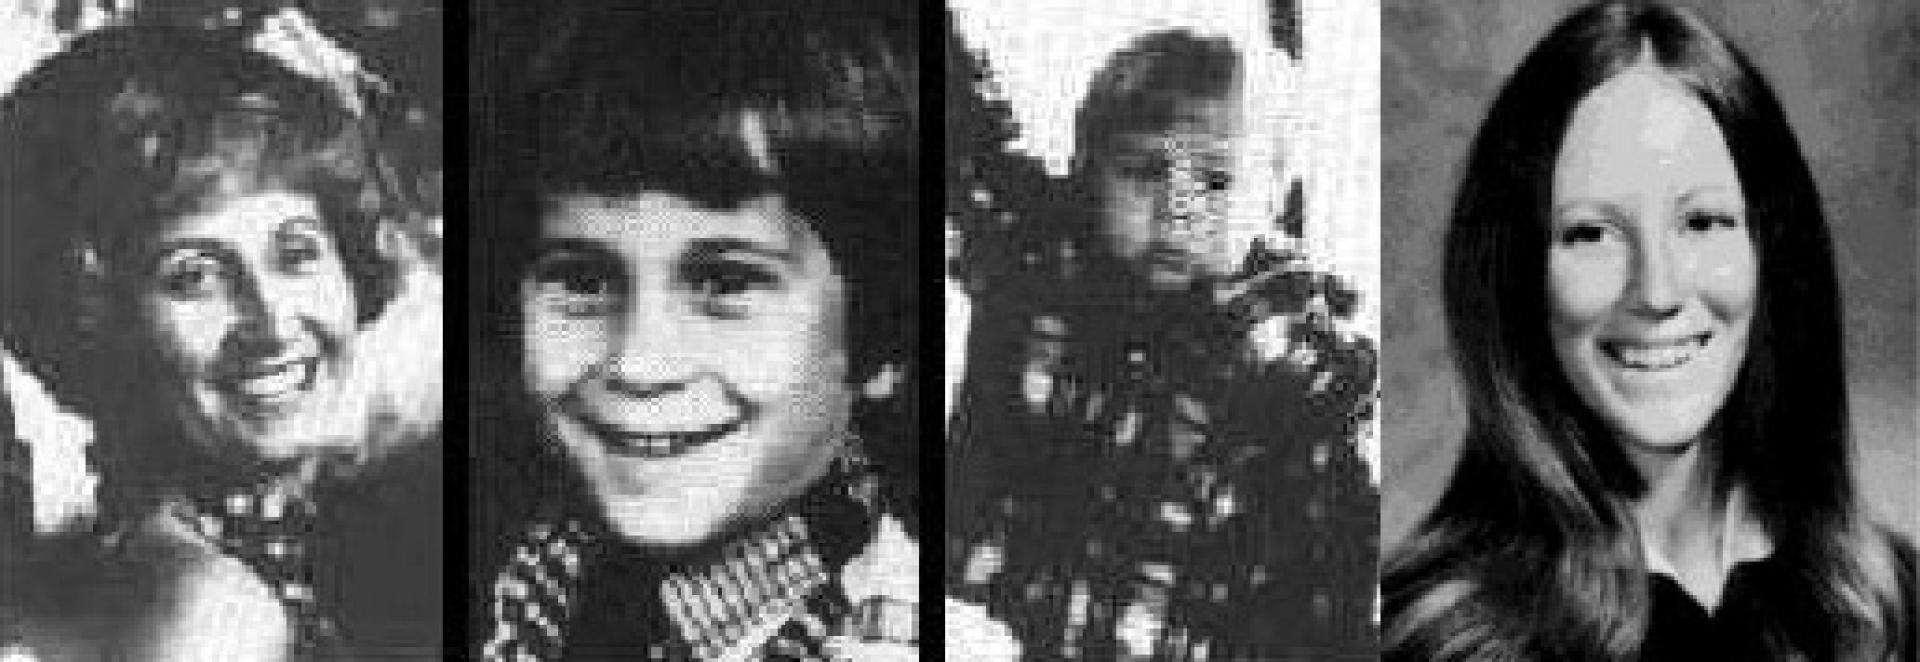 Richard Chase 6. kép